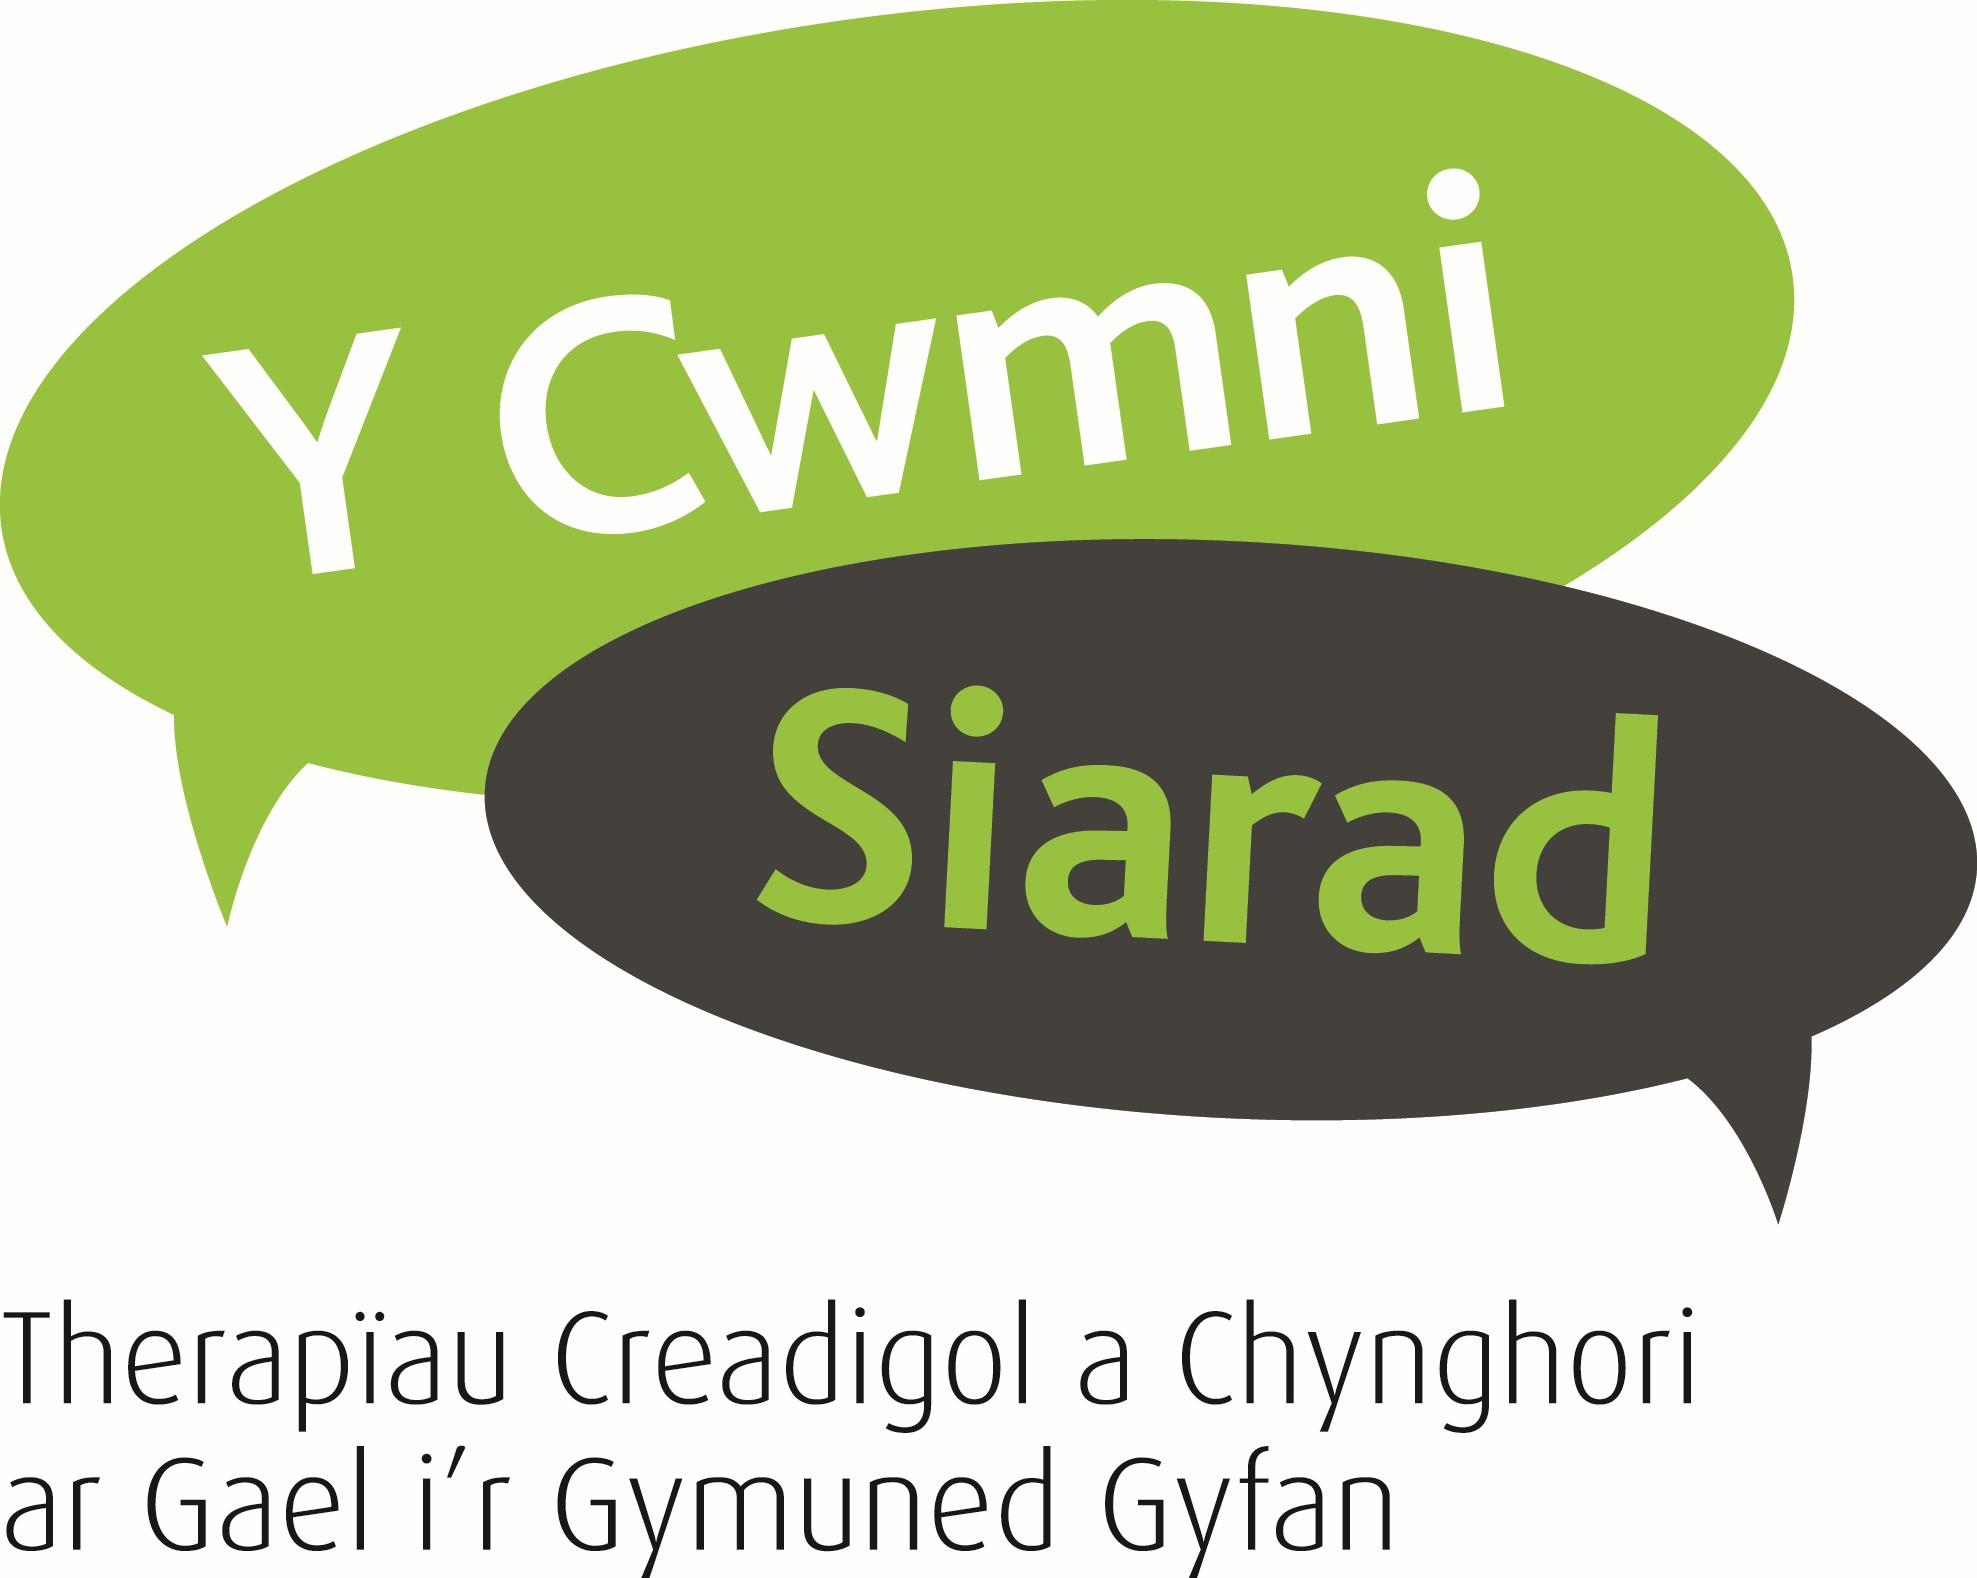 Y Cwmni Siarad (The Talking Company)